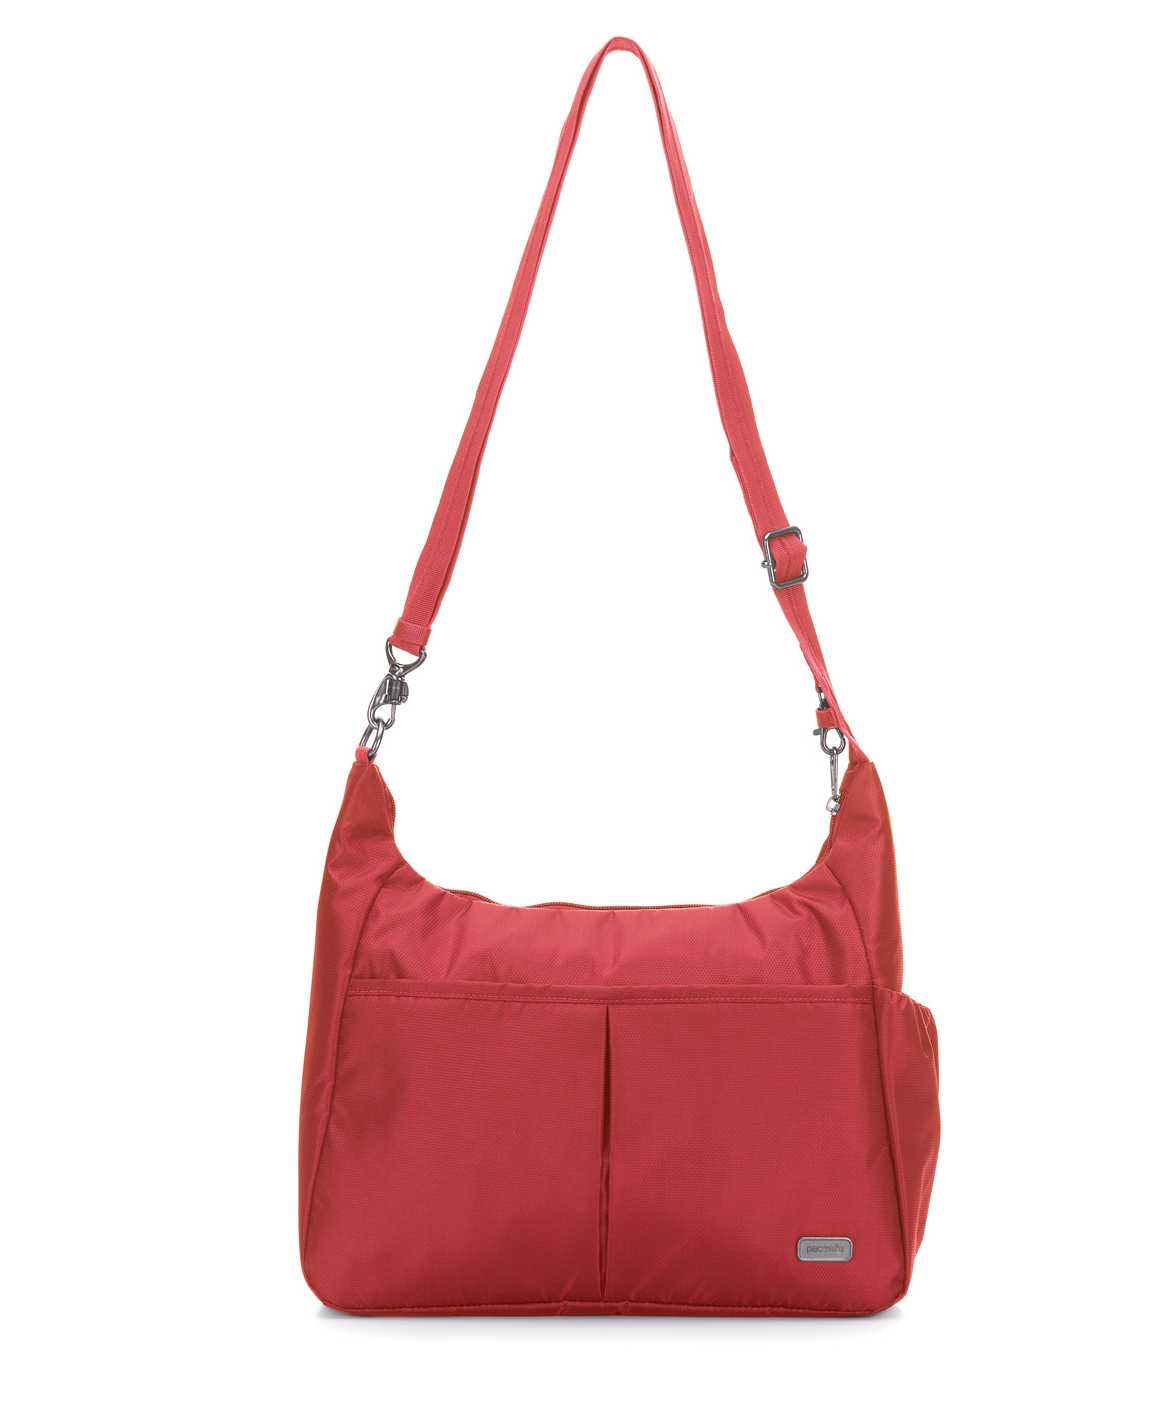 30% Off Daysafe Crossbody Handbag